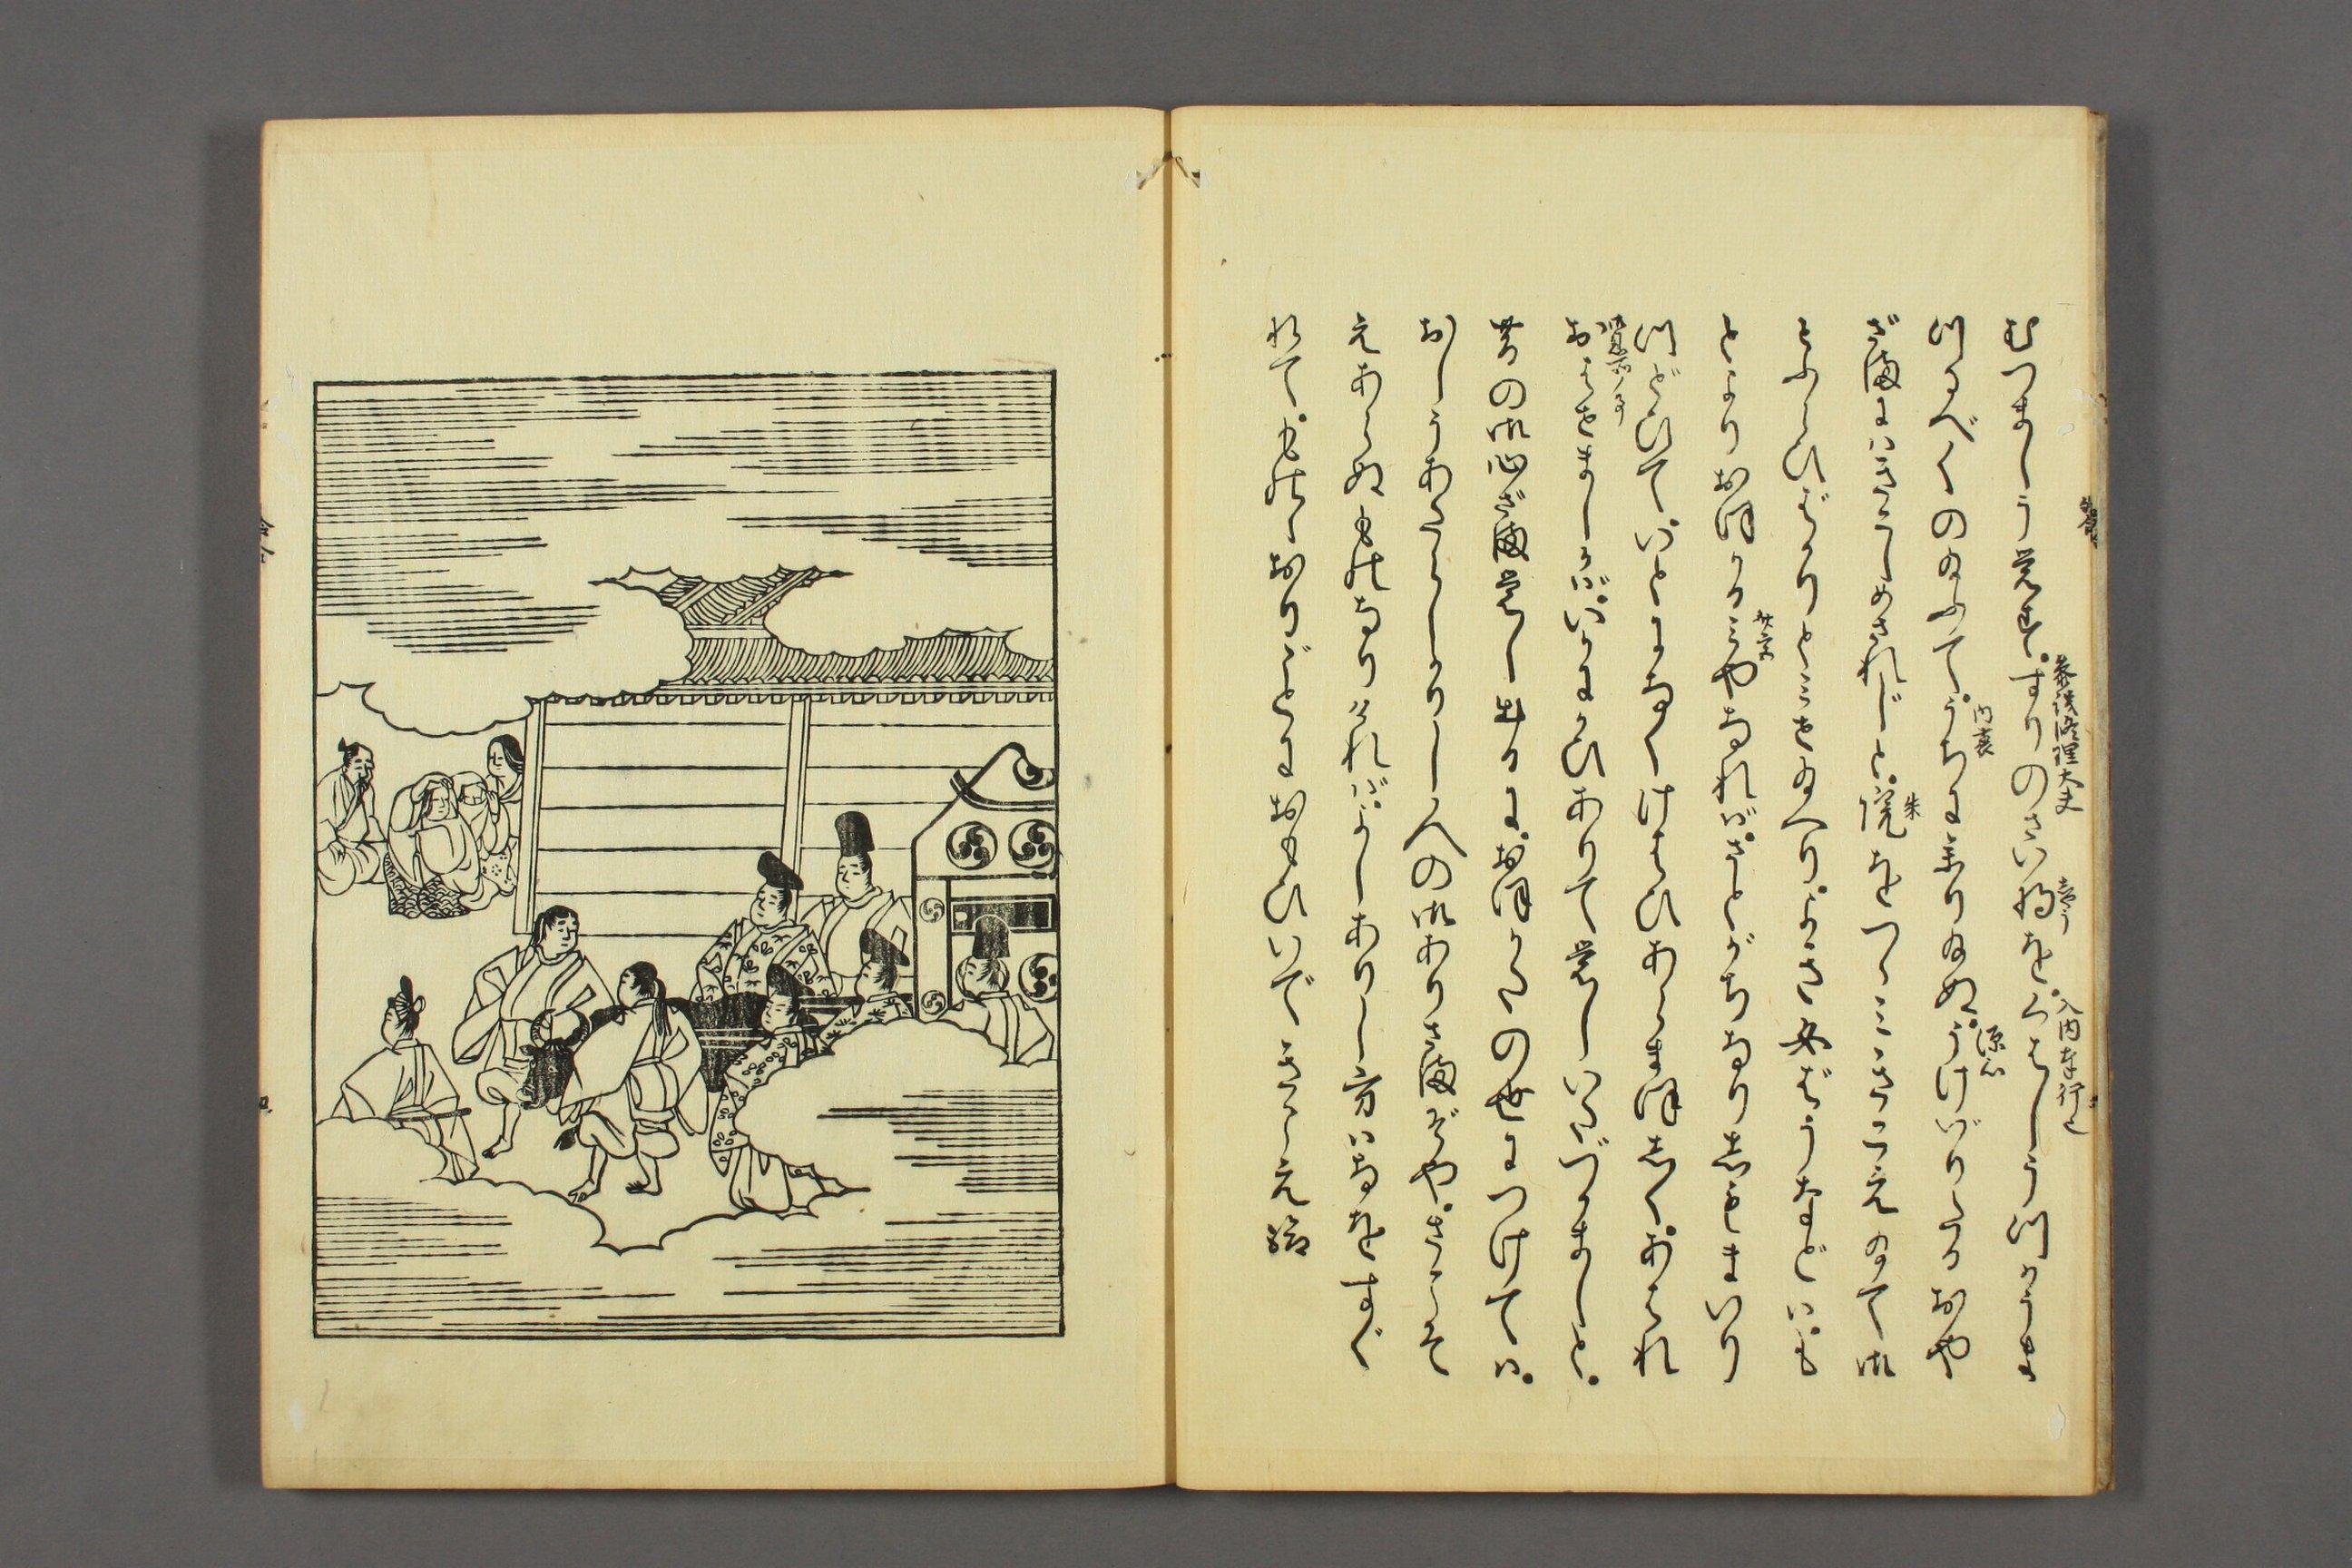 http://archive.wul.waseda.ac.jp/kosho/bunko30/bunko30_a0007/bunko30_a0007_0017/bunko30_a0007_0017_p0005.jpg